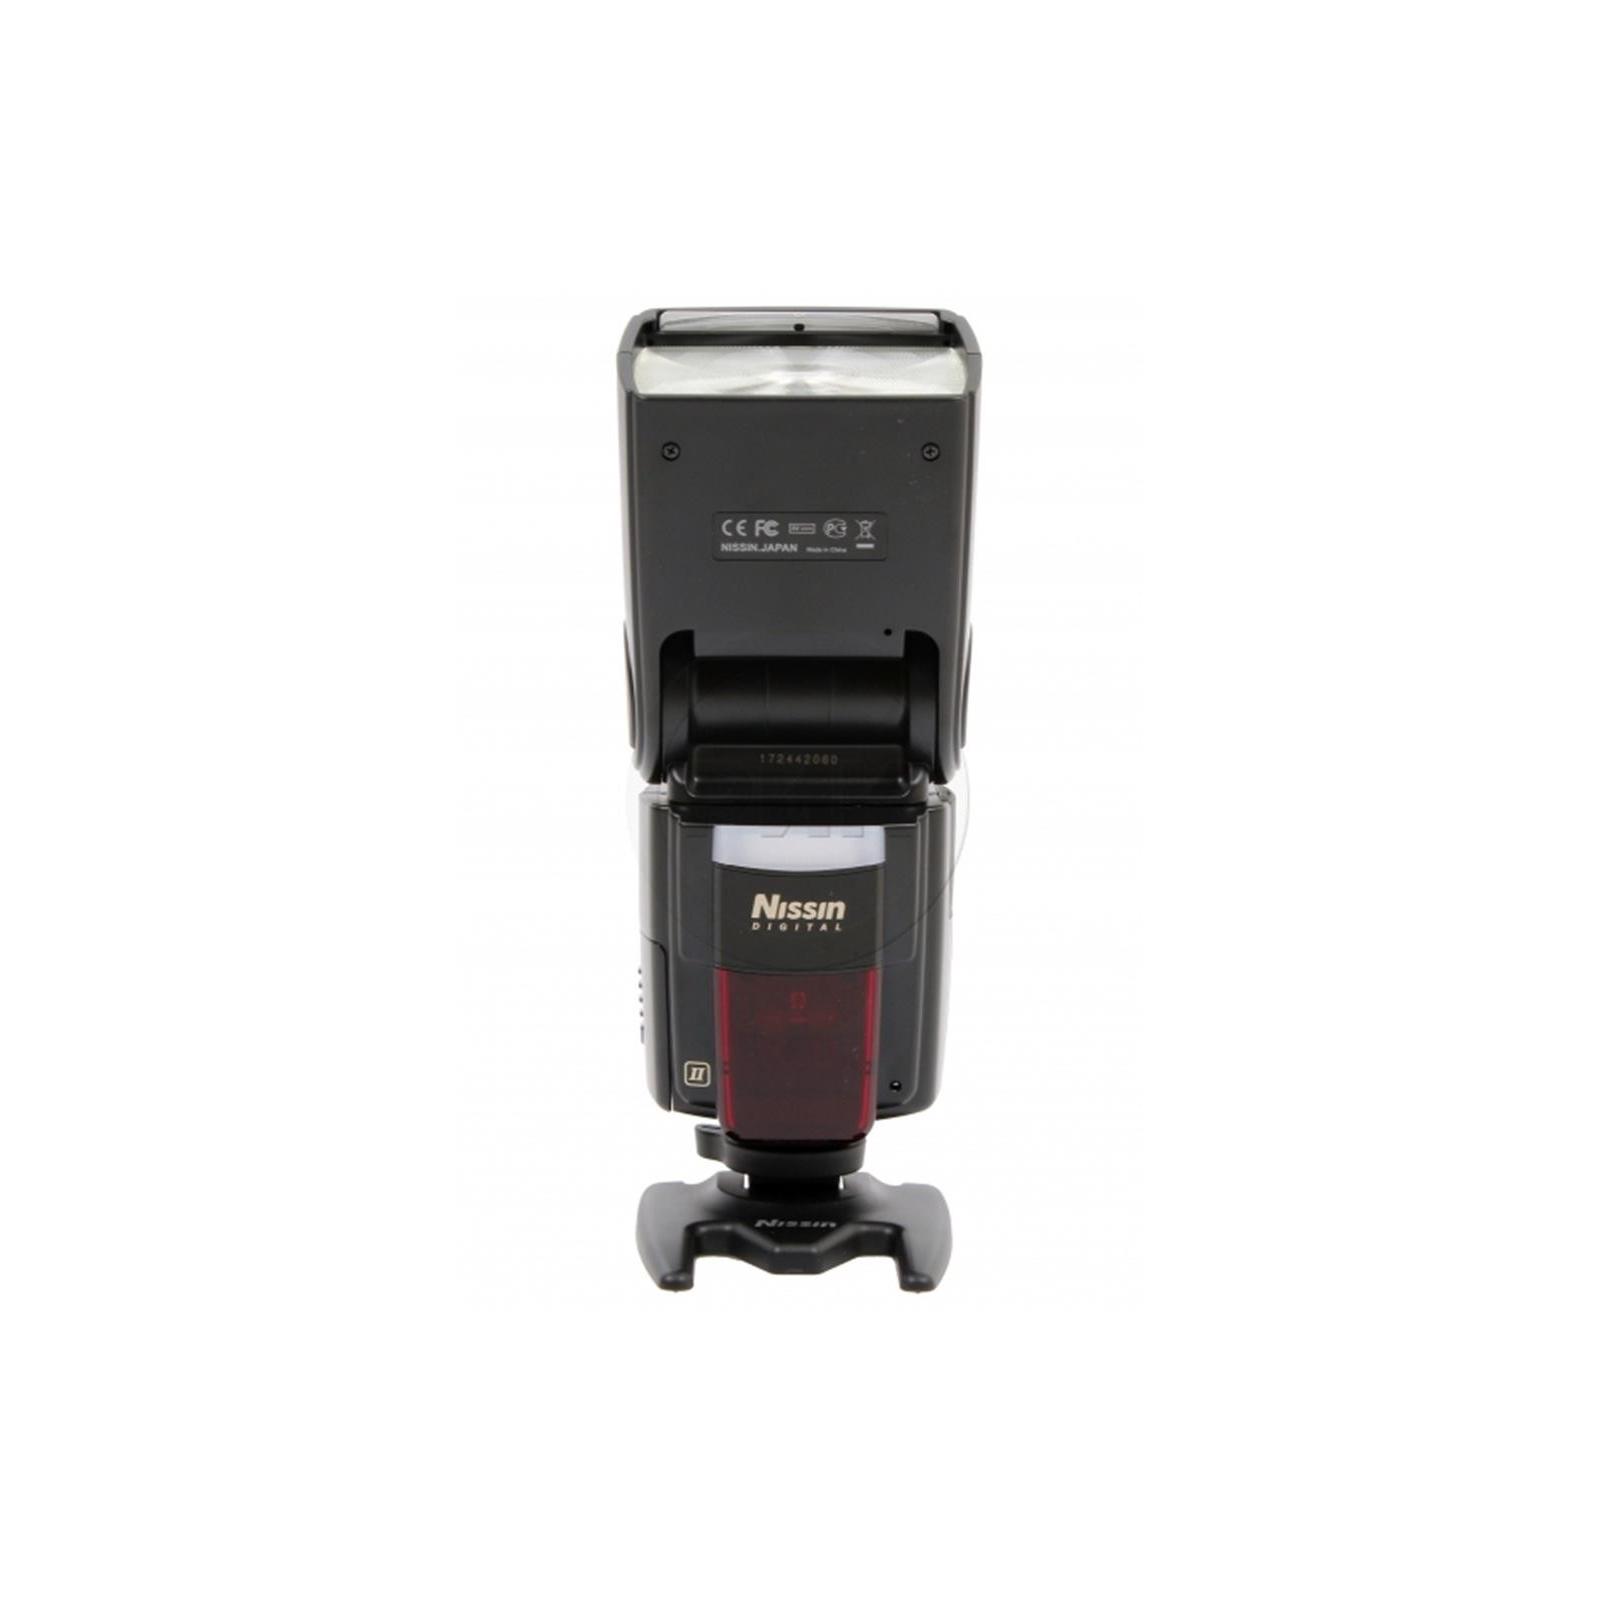 Вспышка Nissin Speedlite Di866 Mark II Sony Alpha + Powerex 2700 (NI-DI822IIS) изображение 3